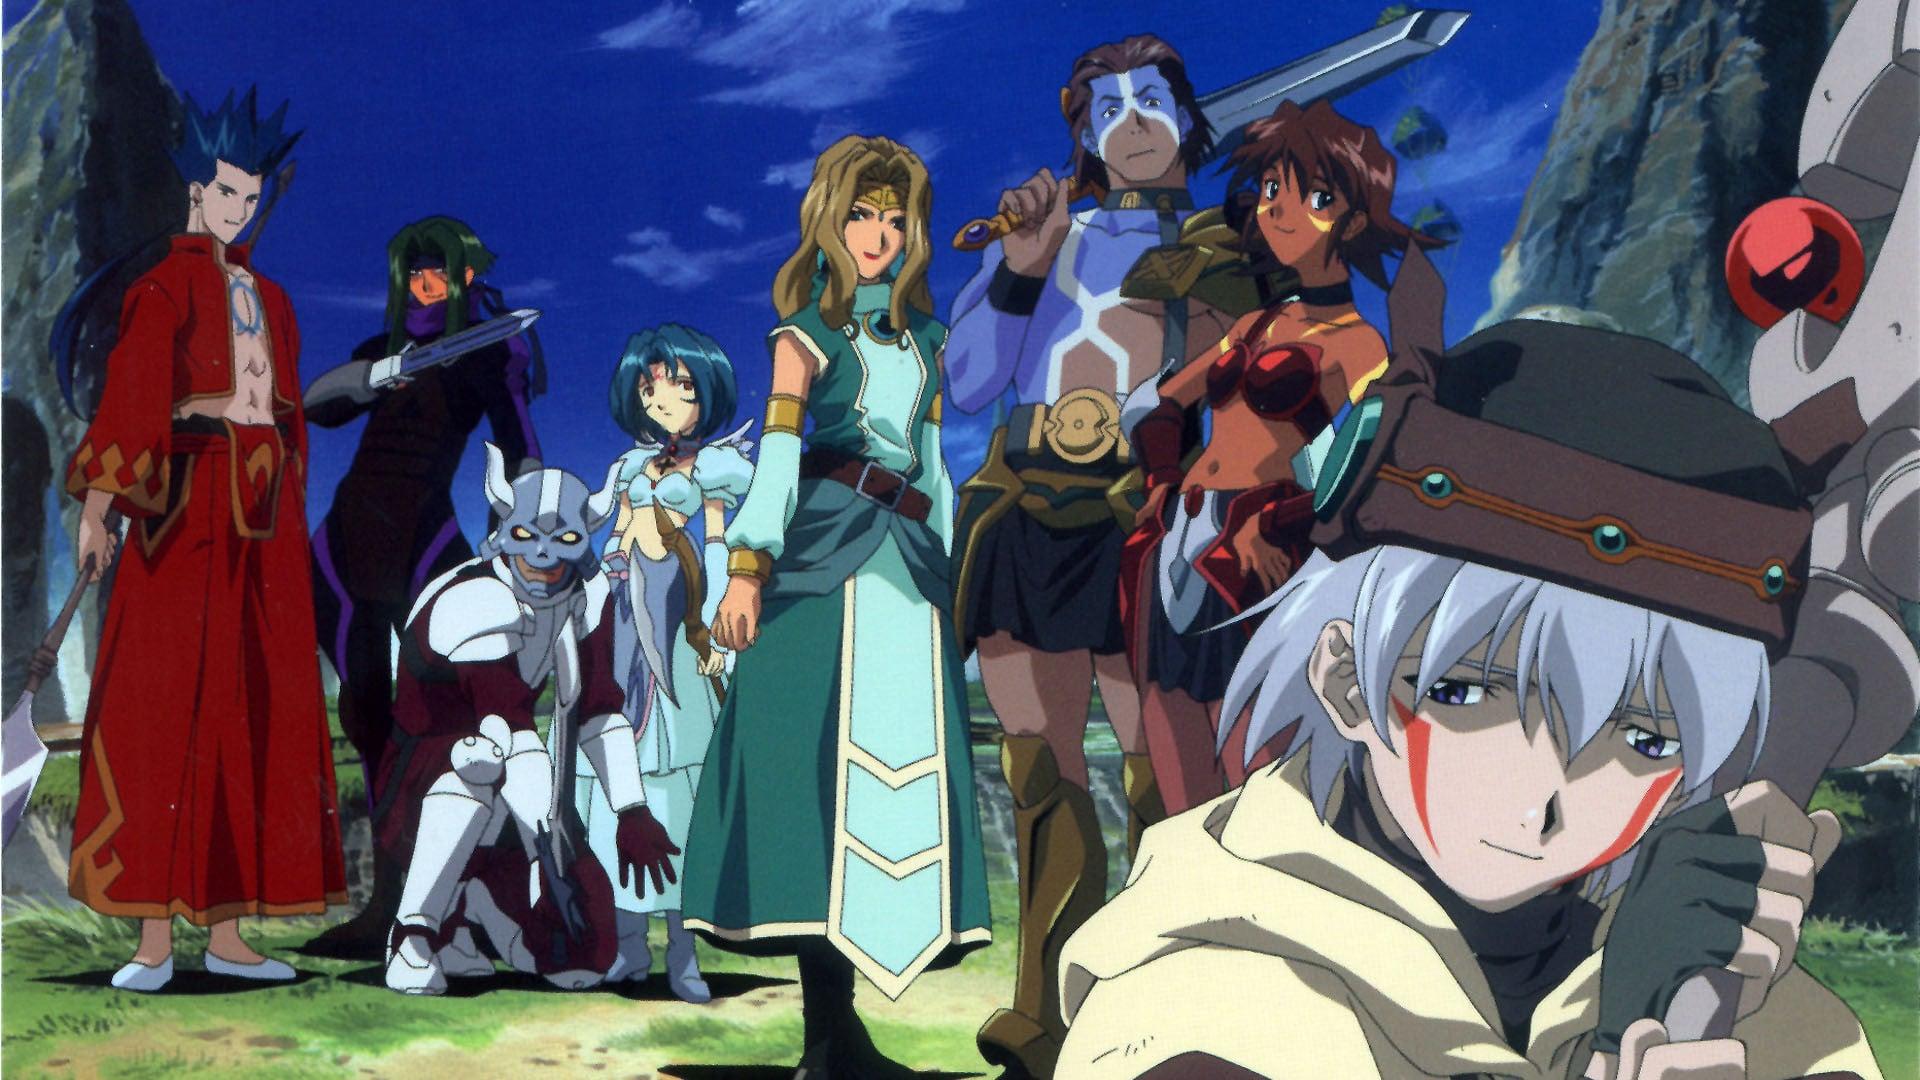 Standing from left to right: Crim, Sora, Silver Knight, Subaru, B.T, Bear, Mimiru, and Tsukasa.